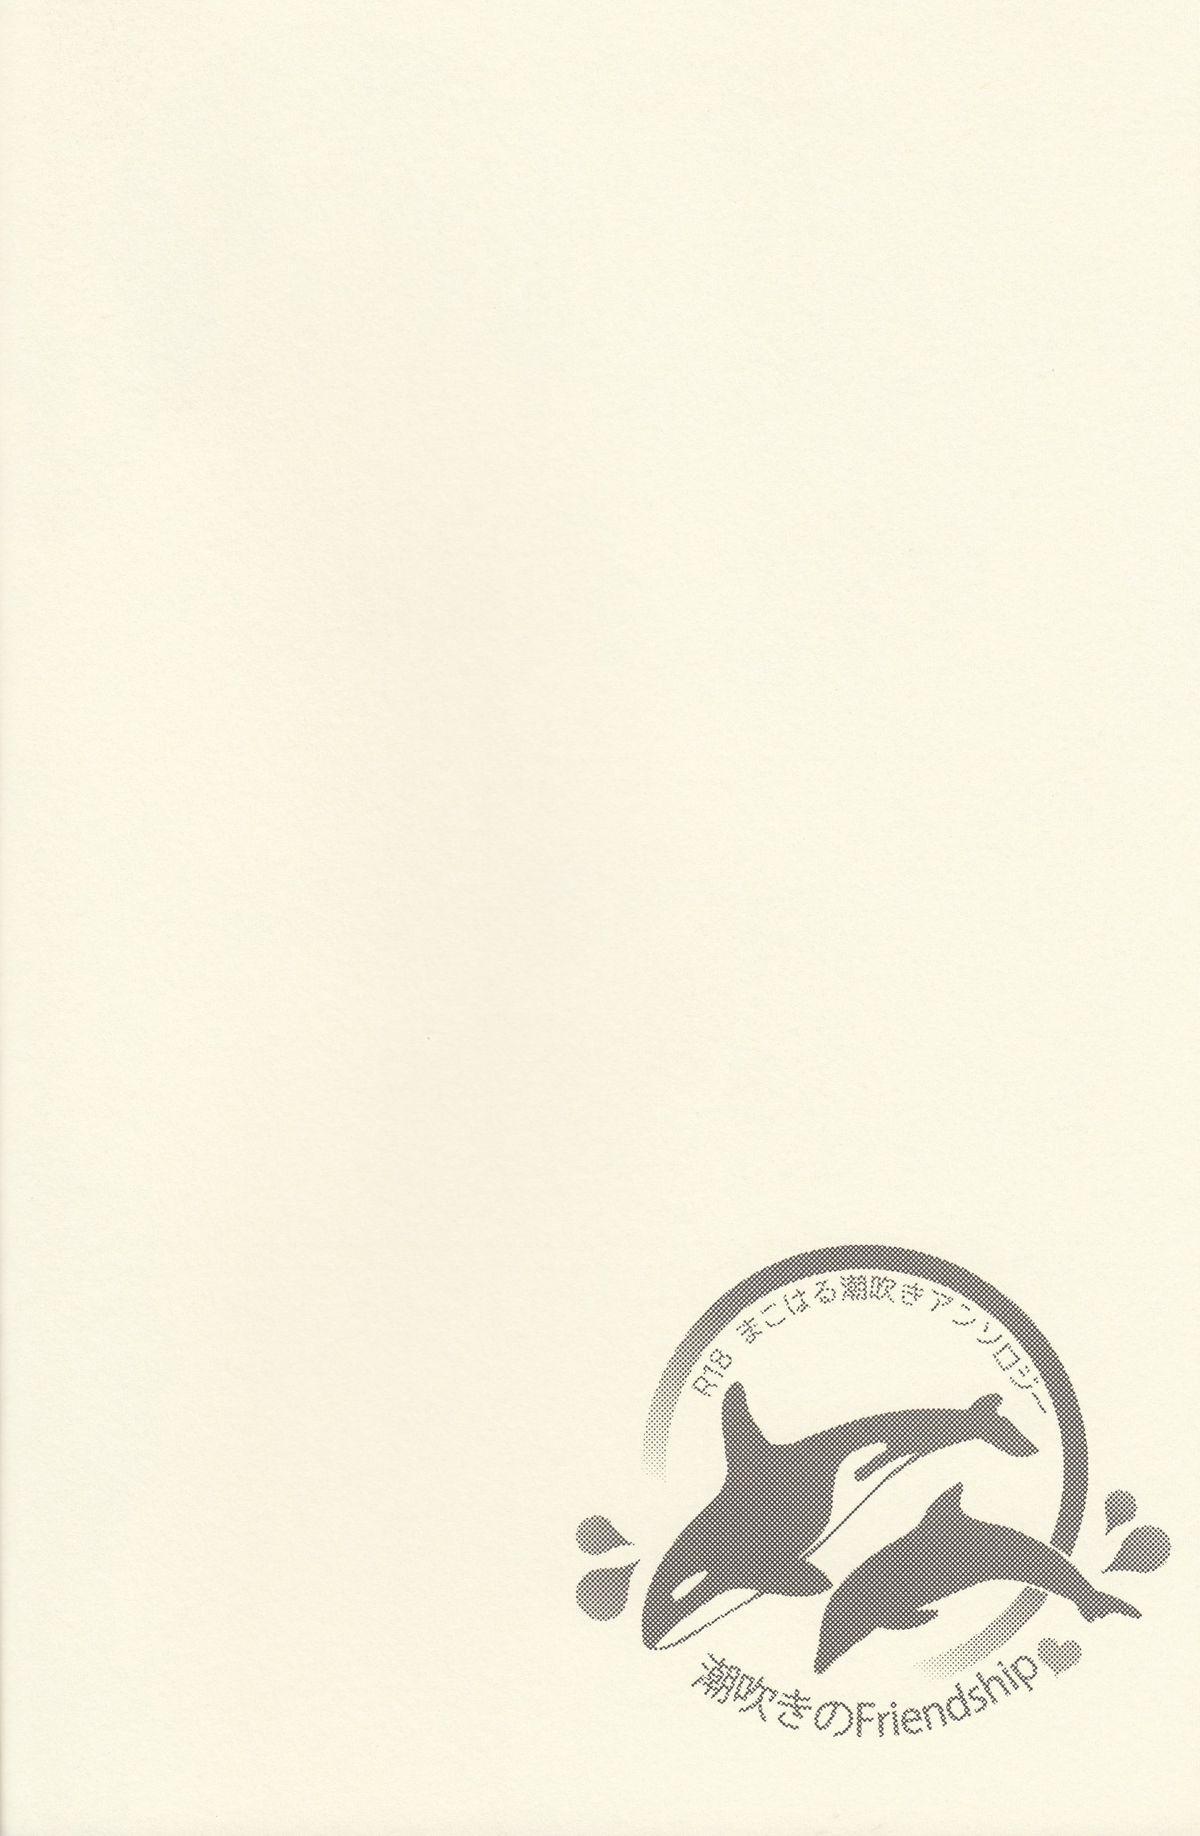 Shiofuki no Friendship - Makoto ♥ Haruka Squirting Anthology 2